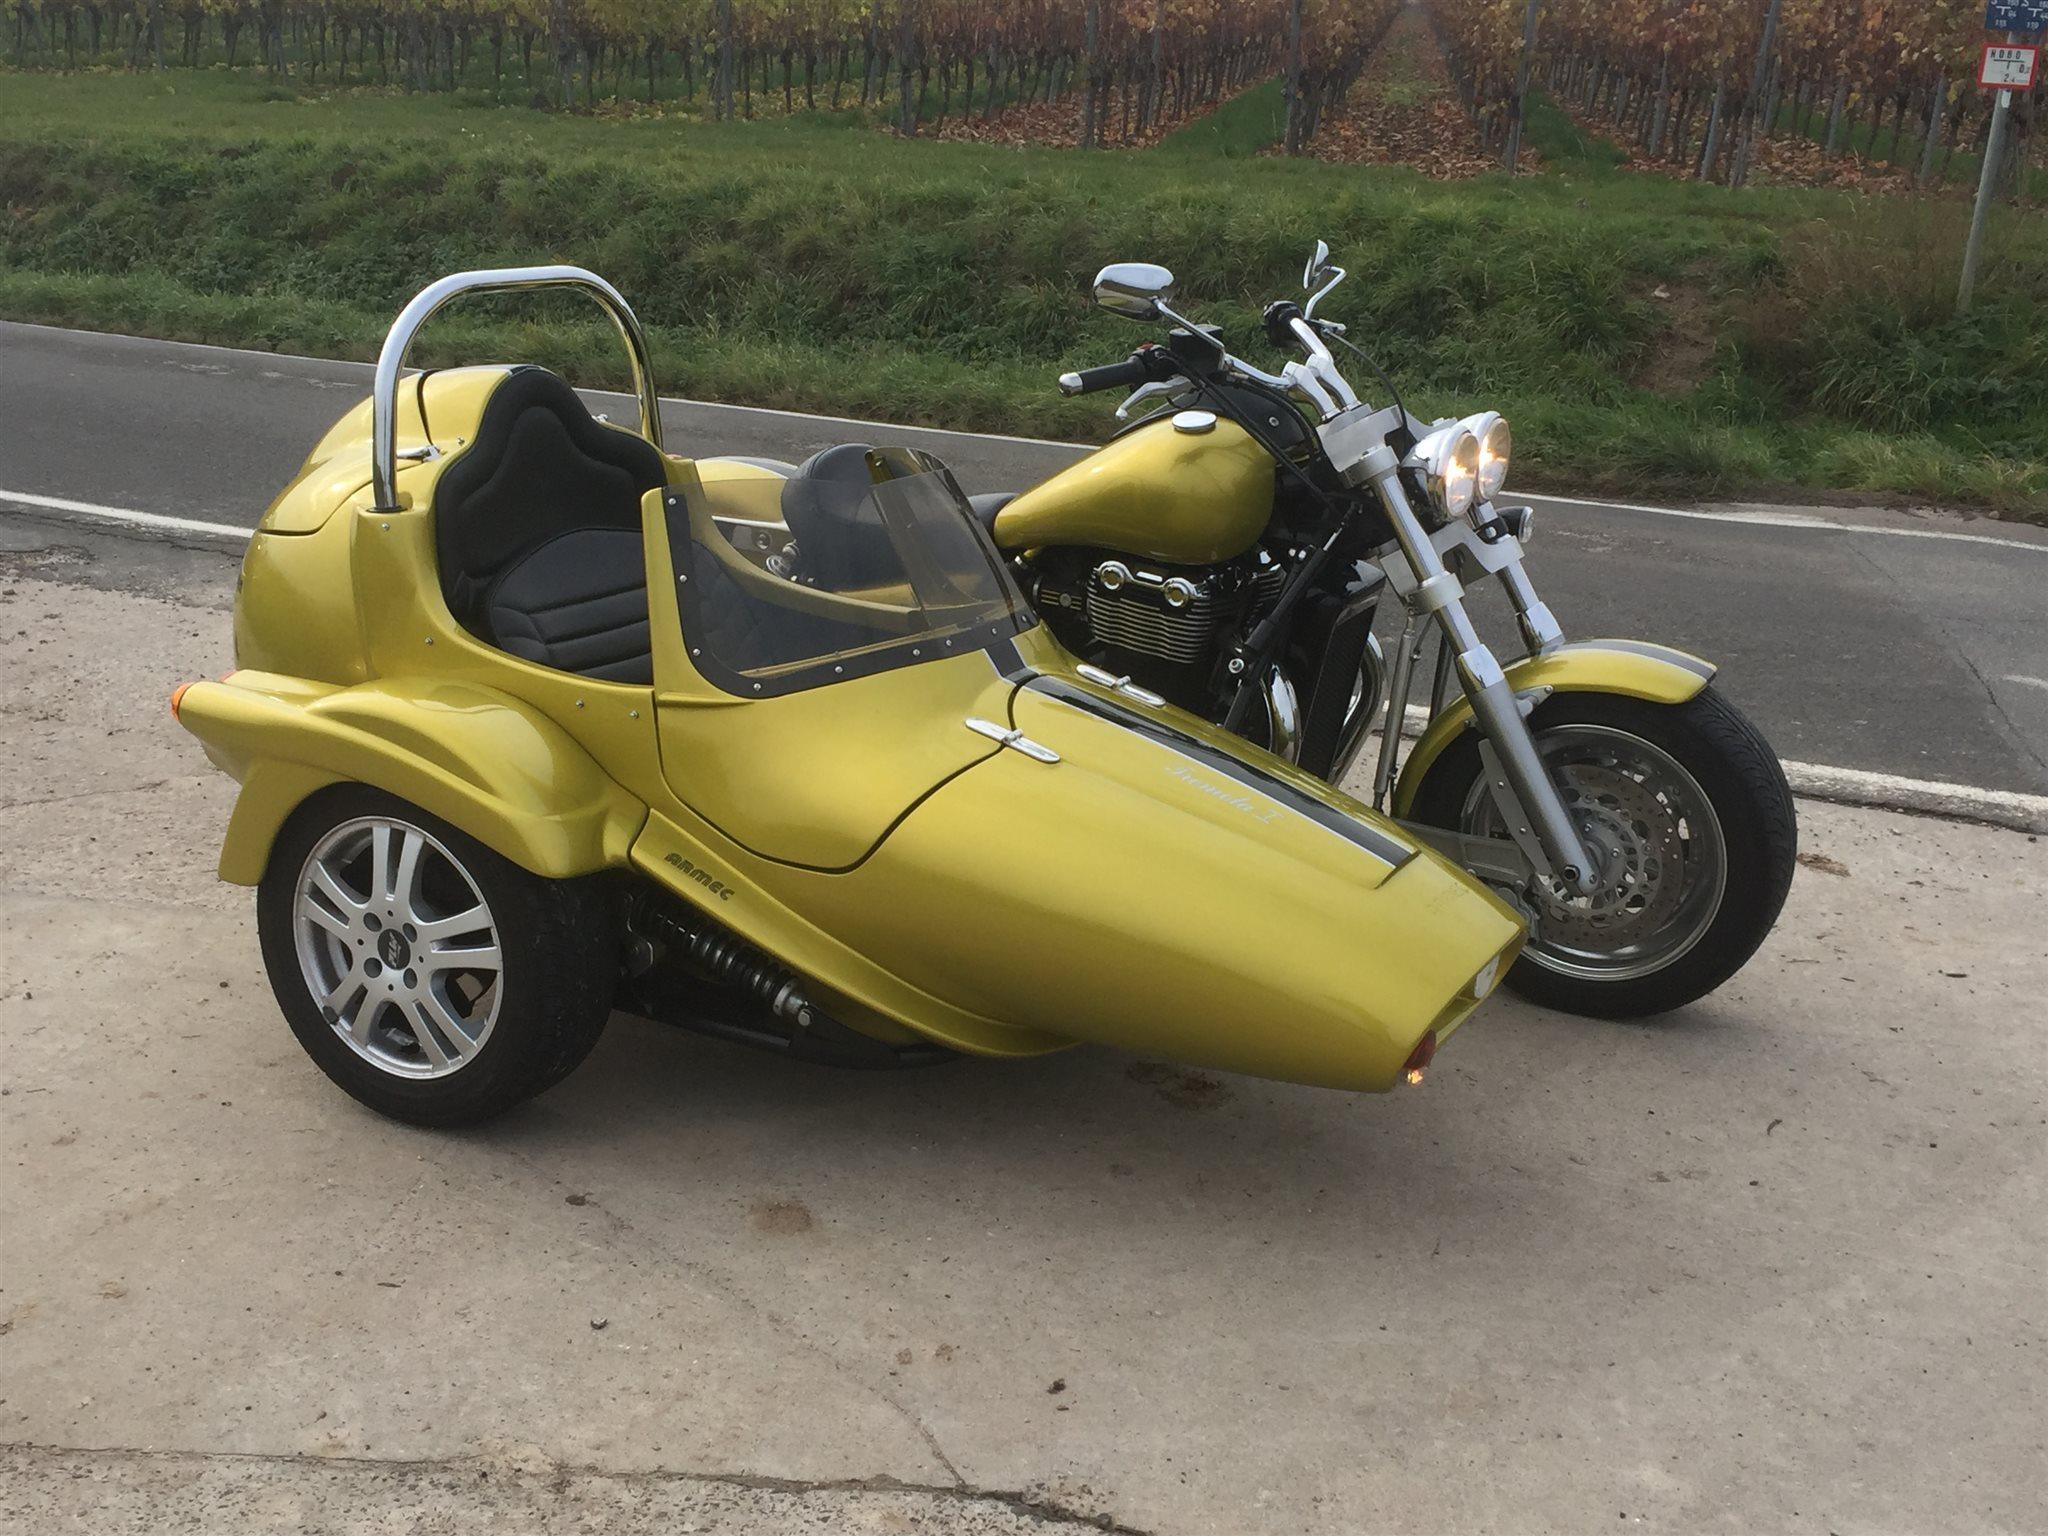 Details On The Custom Bike Triumph Thunderbird Of Dealer Triumph